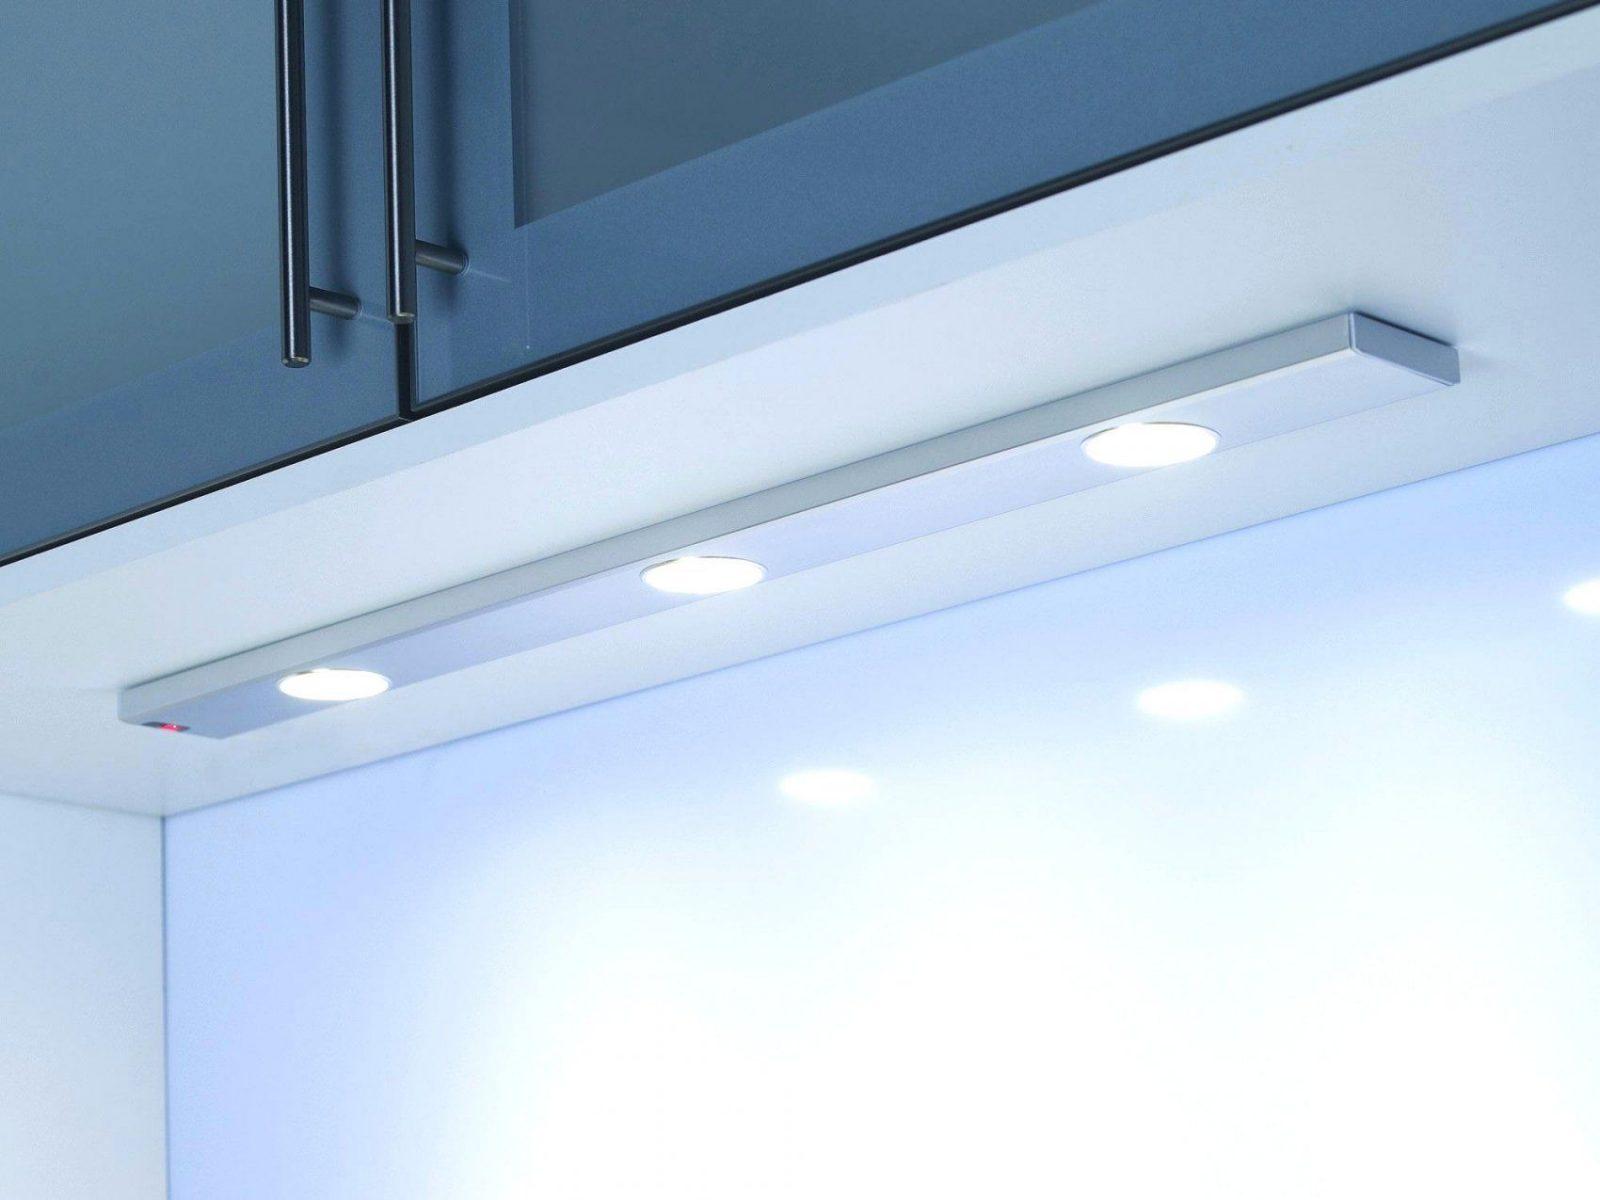 Atemberaubende Ideen Led Unterbauleuchte Küche 230V Und Fantastische von Led Unterbauleuchte Küche 230V Photo